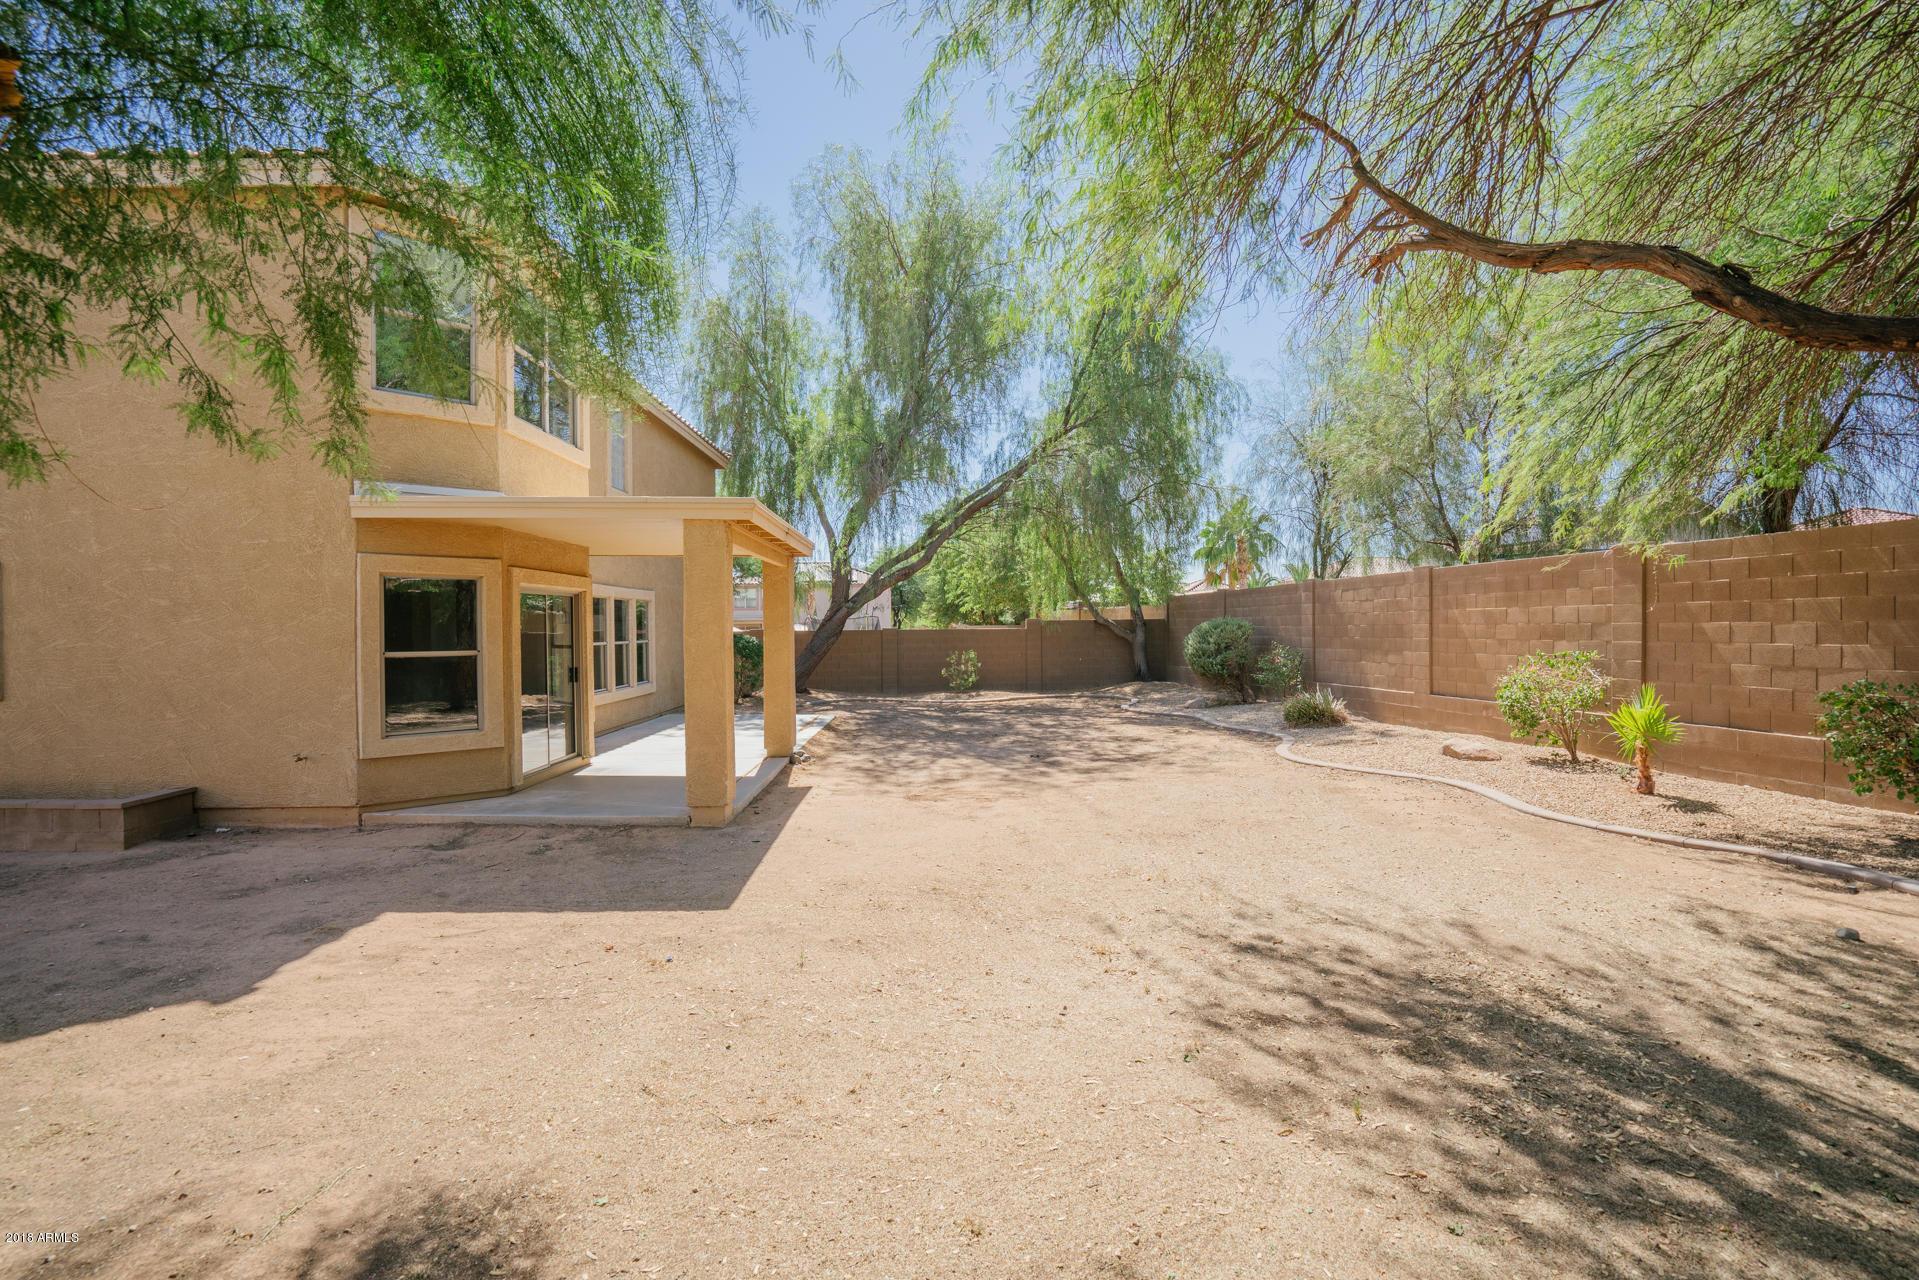 MLS 5826935 12648 N 150TH Court, Surprise, AZ 85379 Surprise AZ Rancho Gabriela